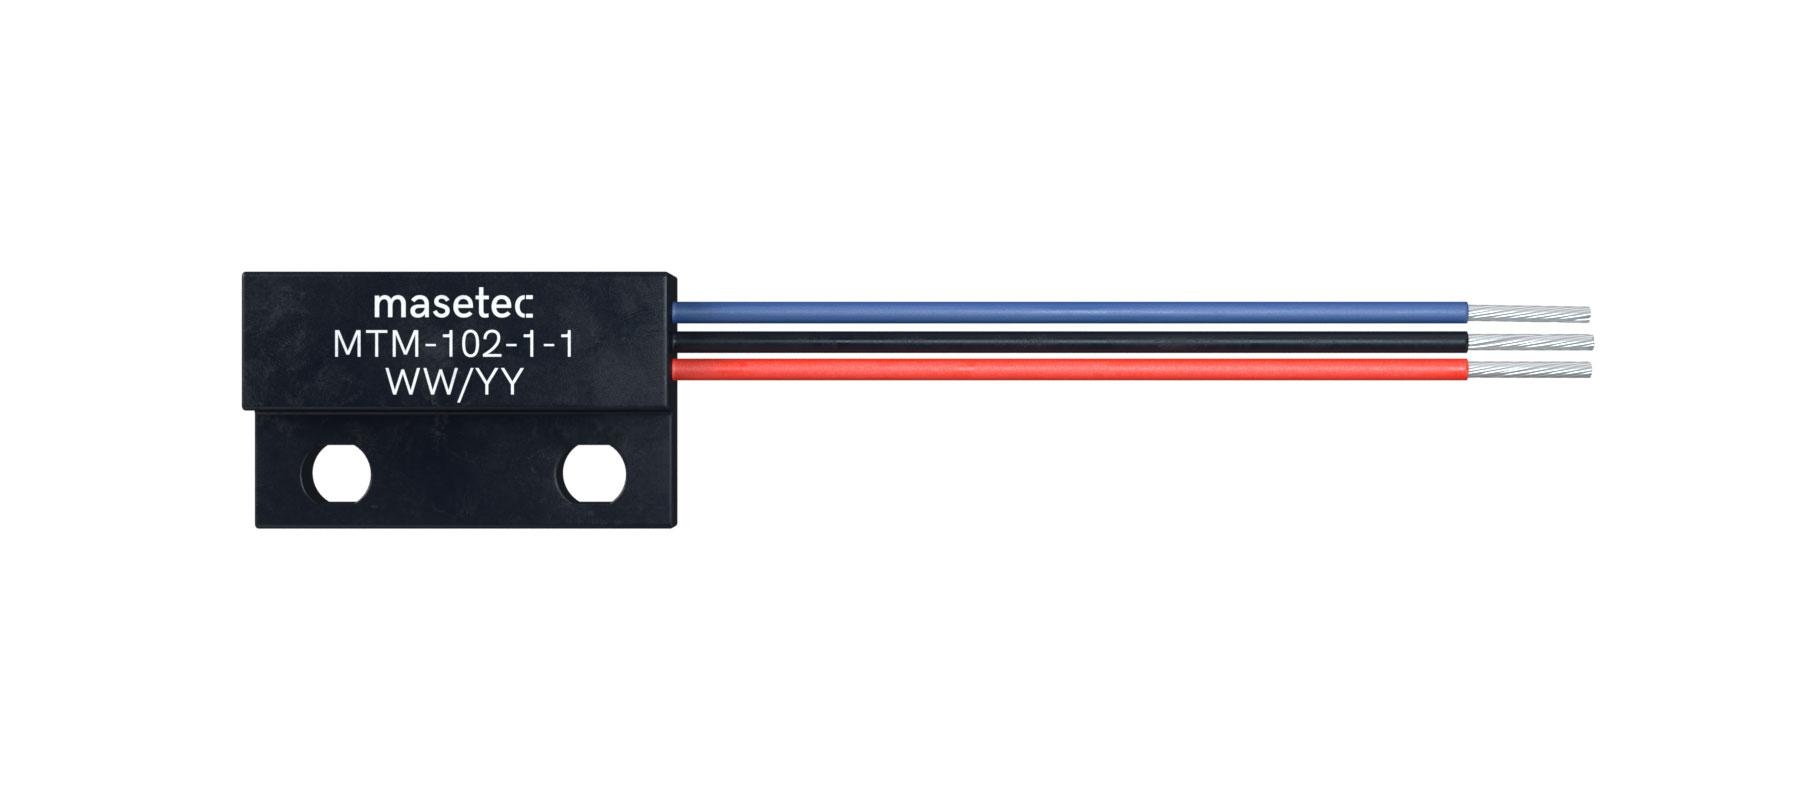 TMR Sensor Bipolar Switch MTM-102-4